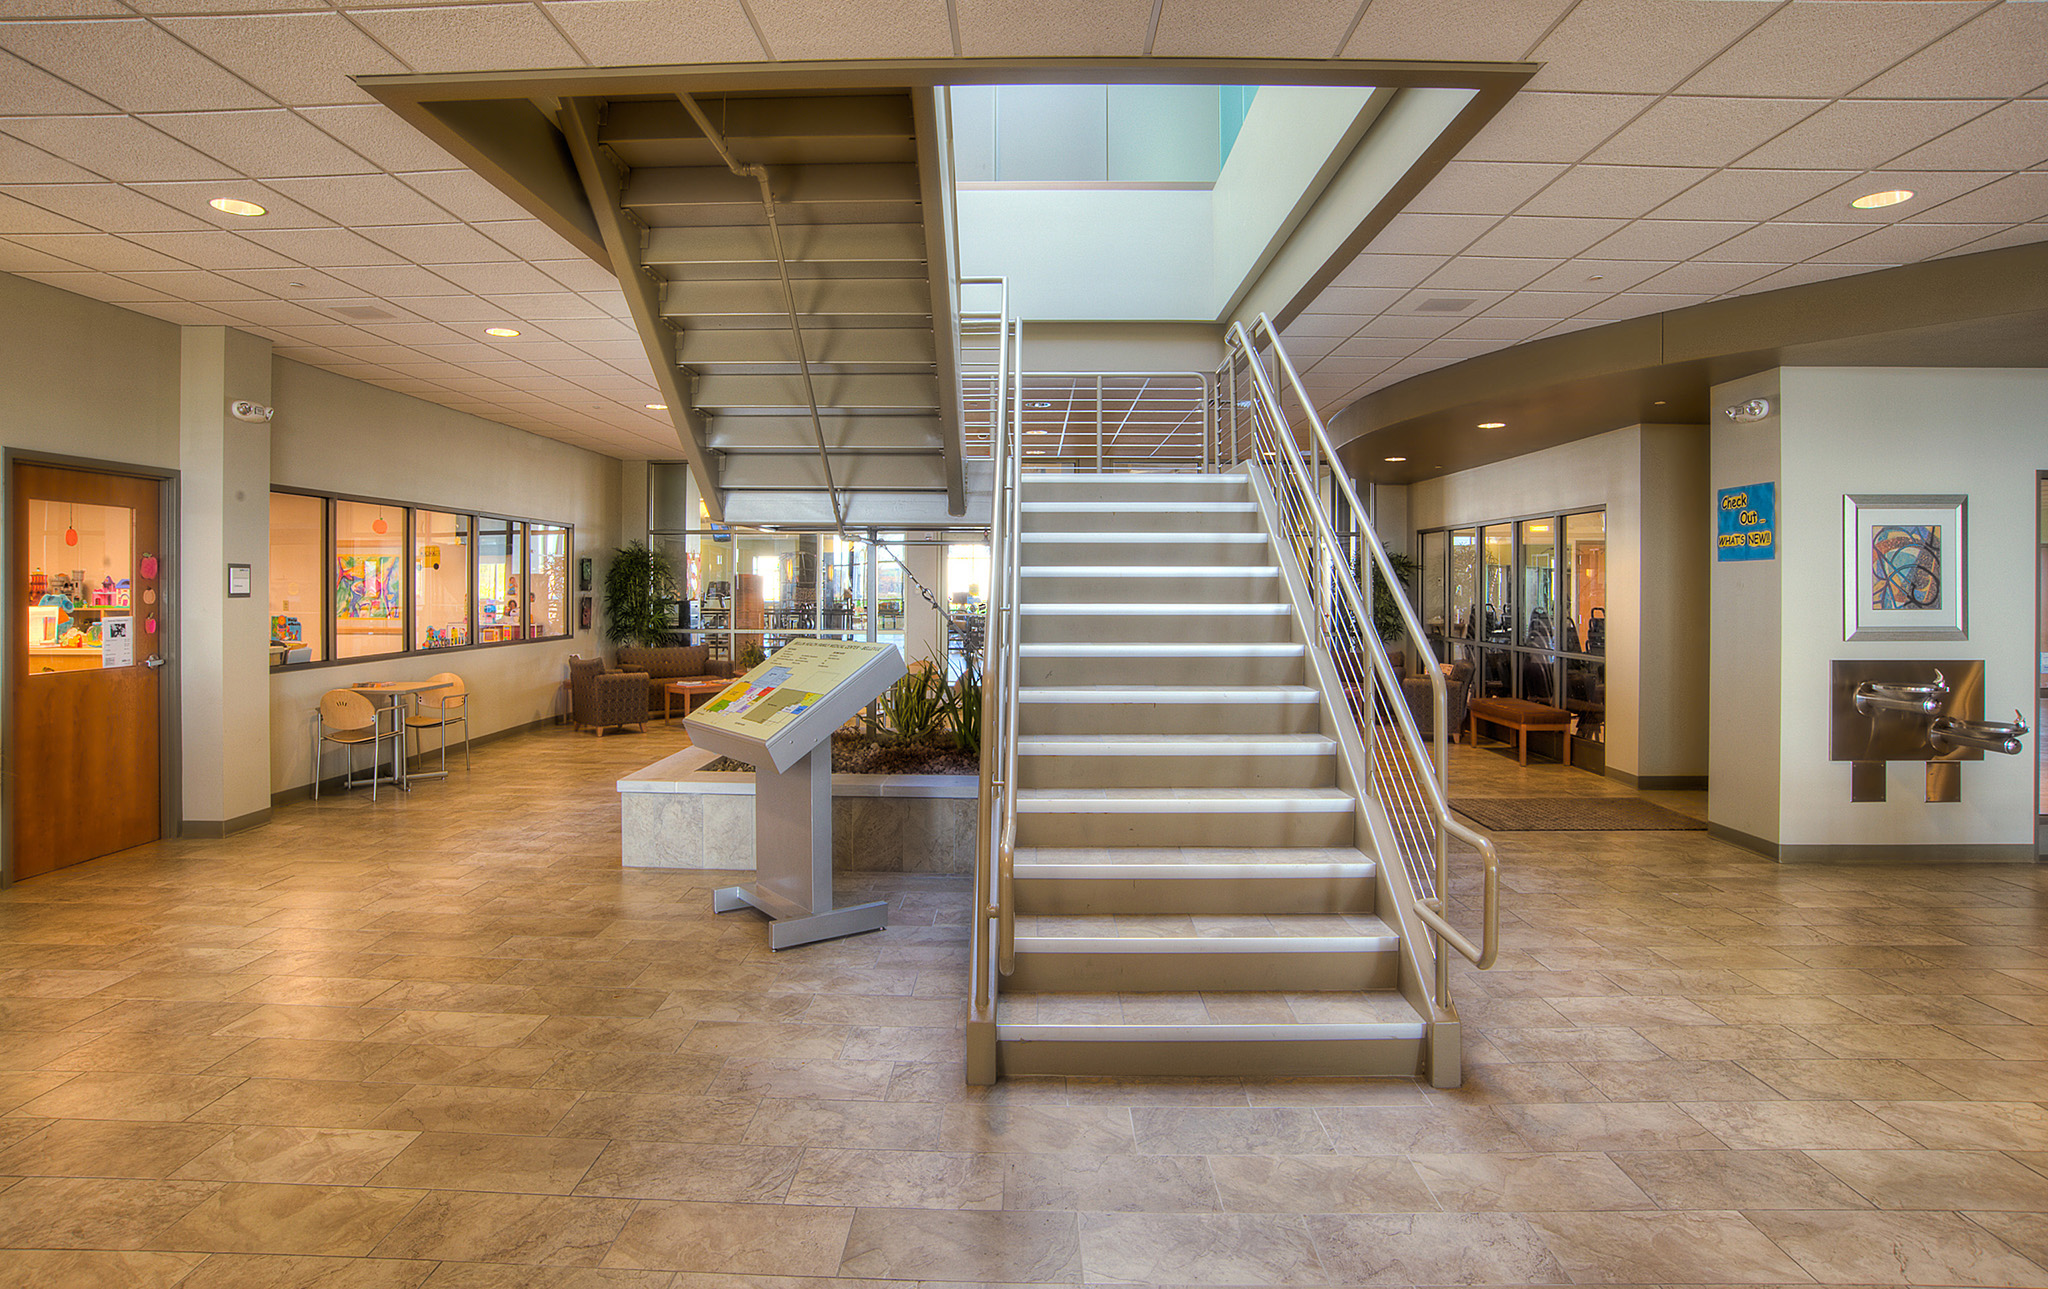 4_Bellevue-Family-Medical-Center